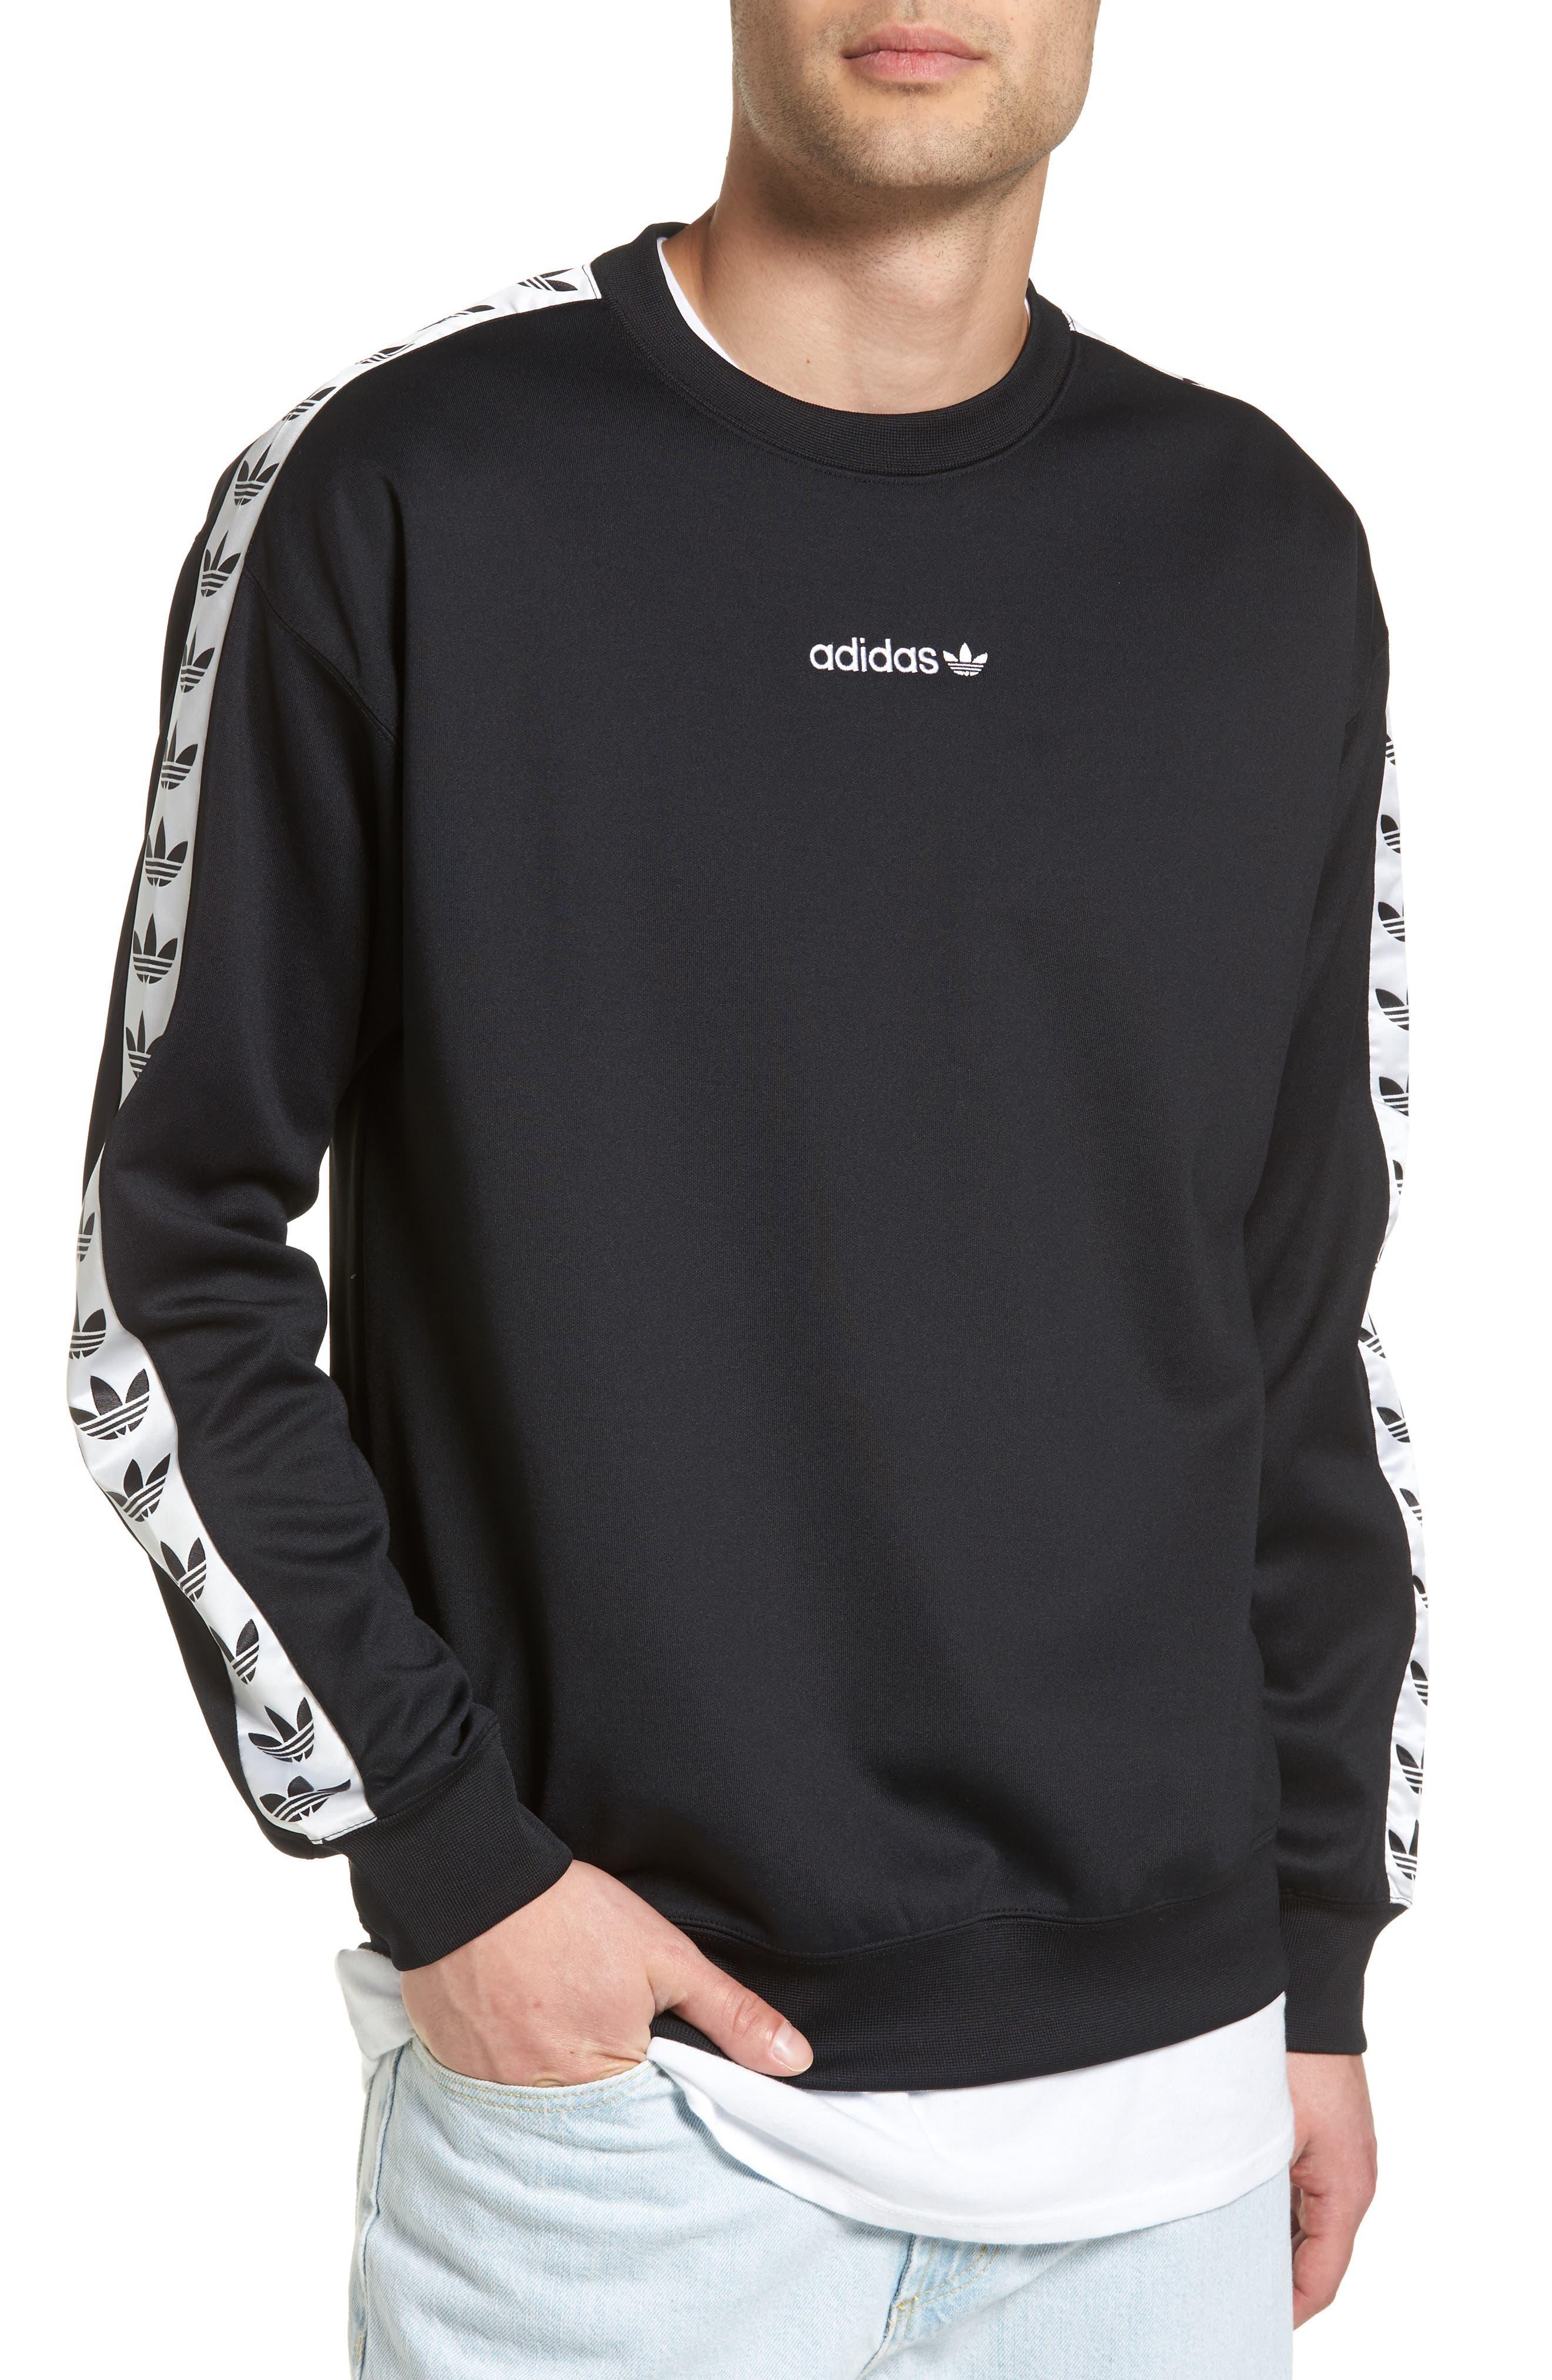 Main Image - adidas Originals TNT Trefoil Sweatshirt